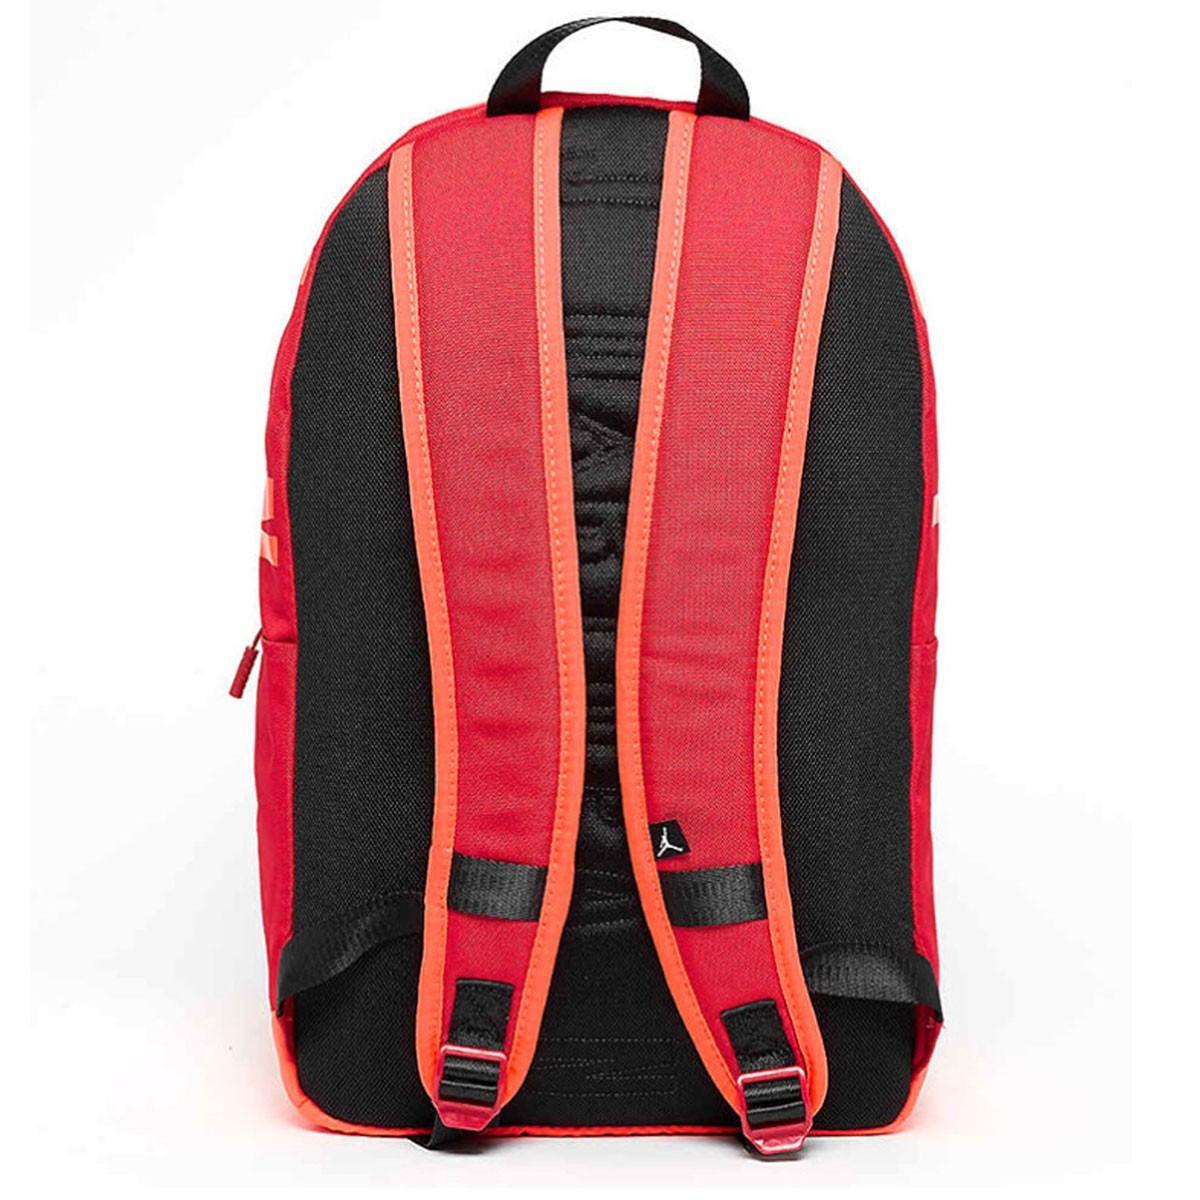 Jordan Air Patrol Backpack 'Red' 9A0172-R78